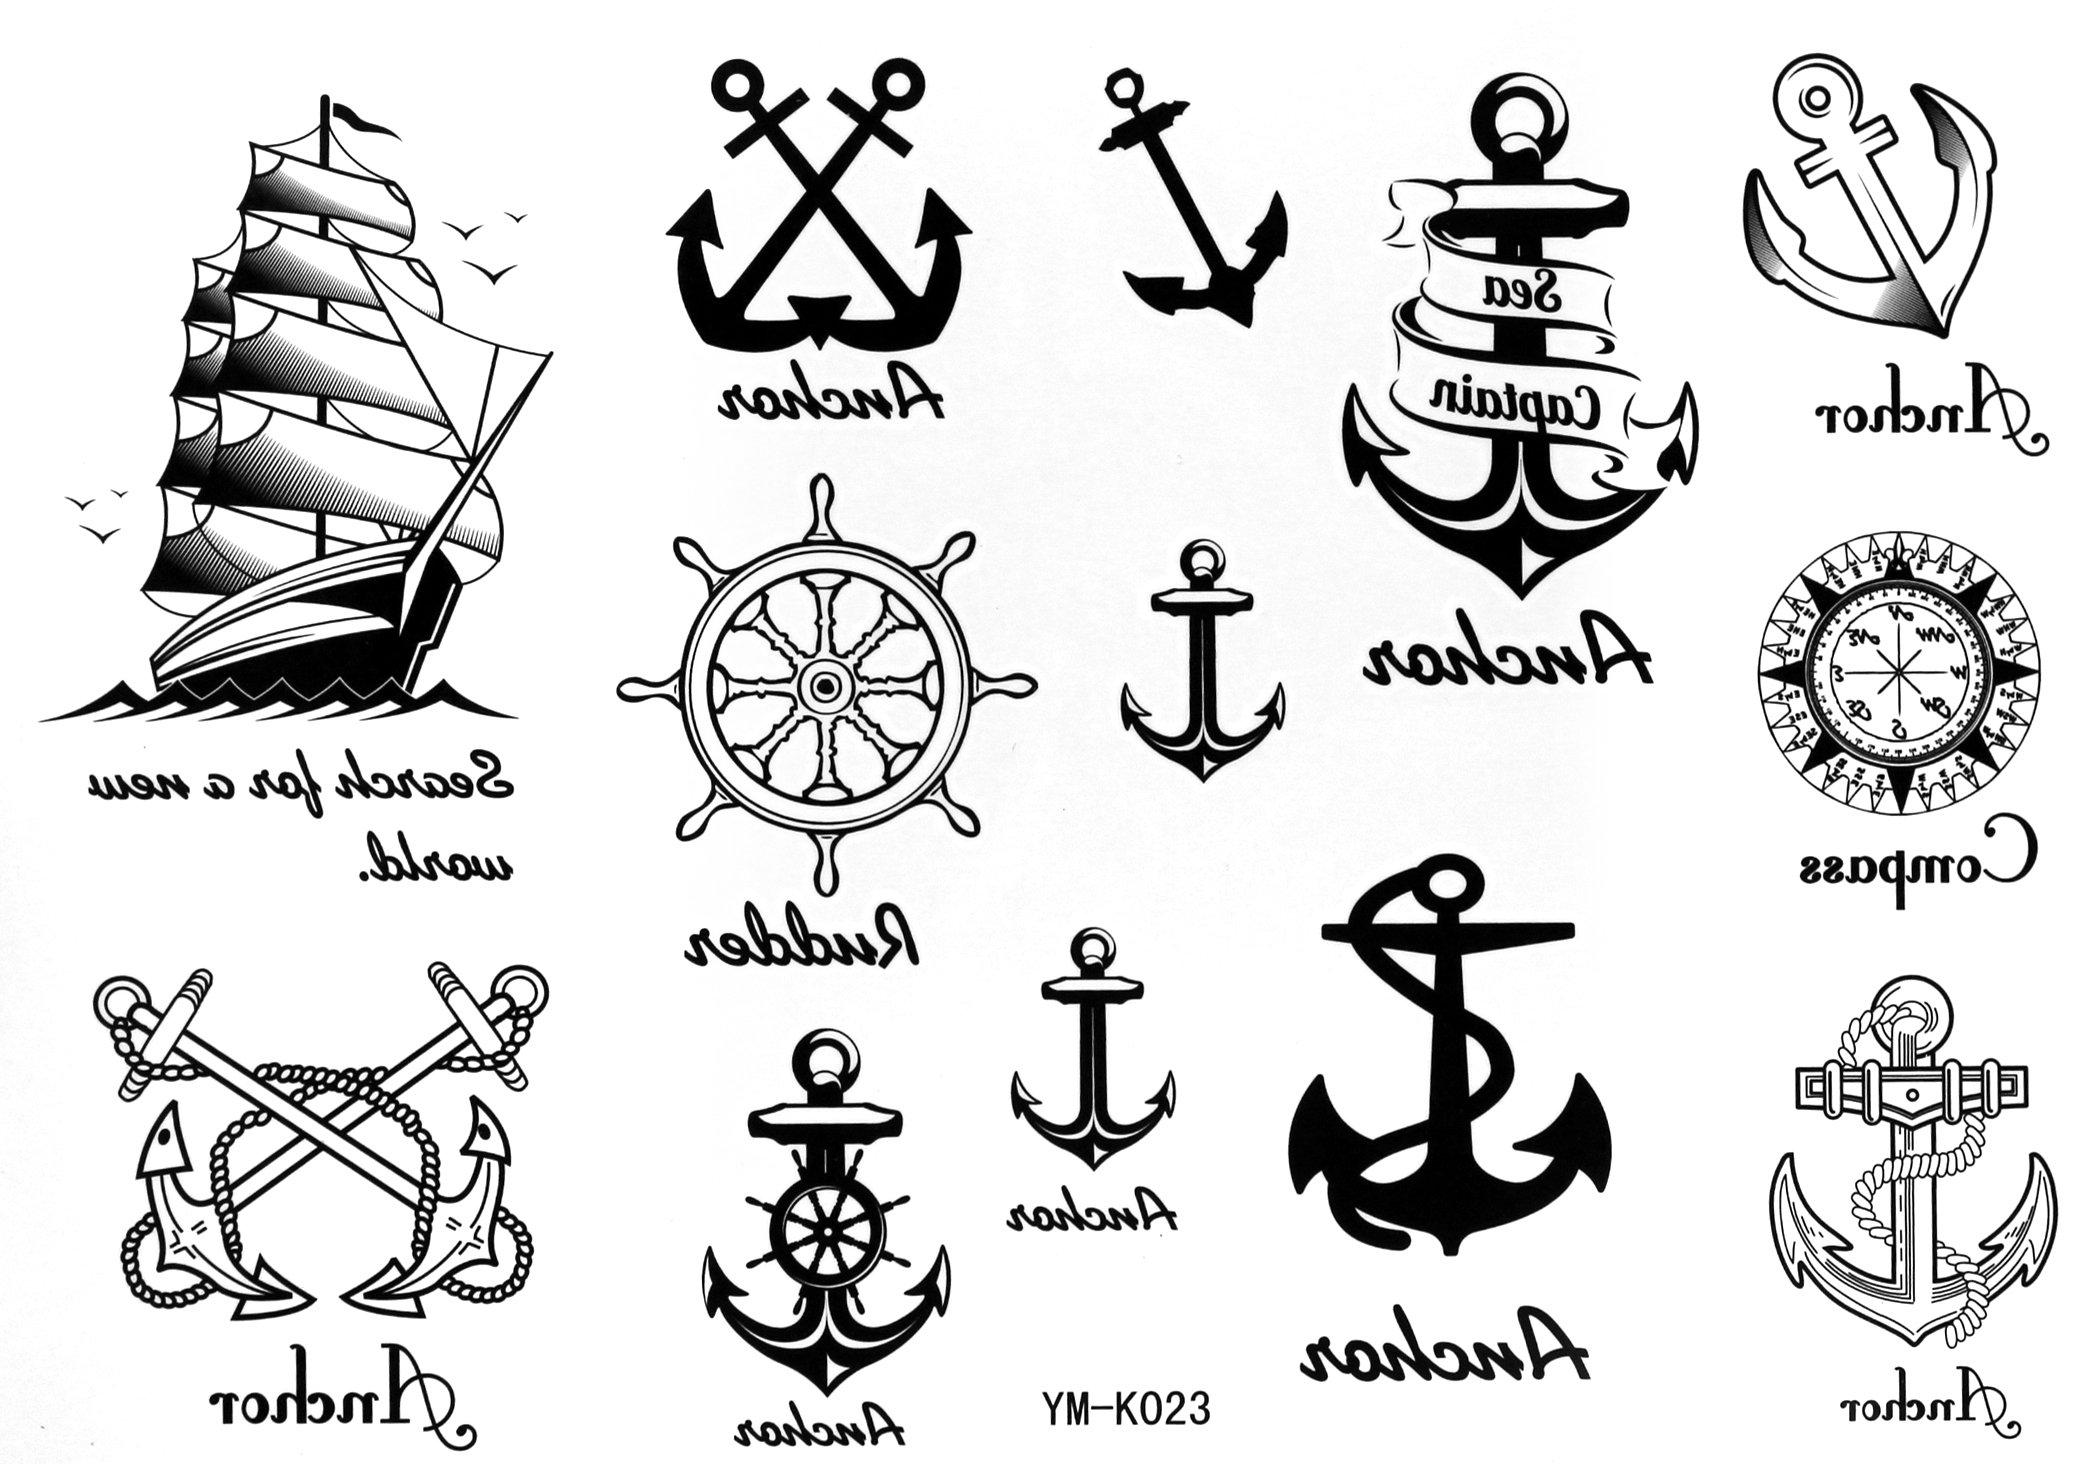 a4c3d722a9f48 Amazon.com : Sailor Temporary Tattoos Waterproof Tattoo Sticker Anchor  Nautical Tattoo Stickers : Body Paint Makeup : Beauty